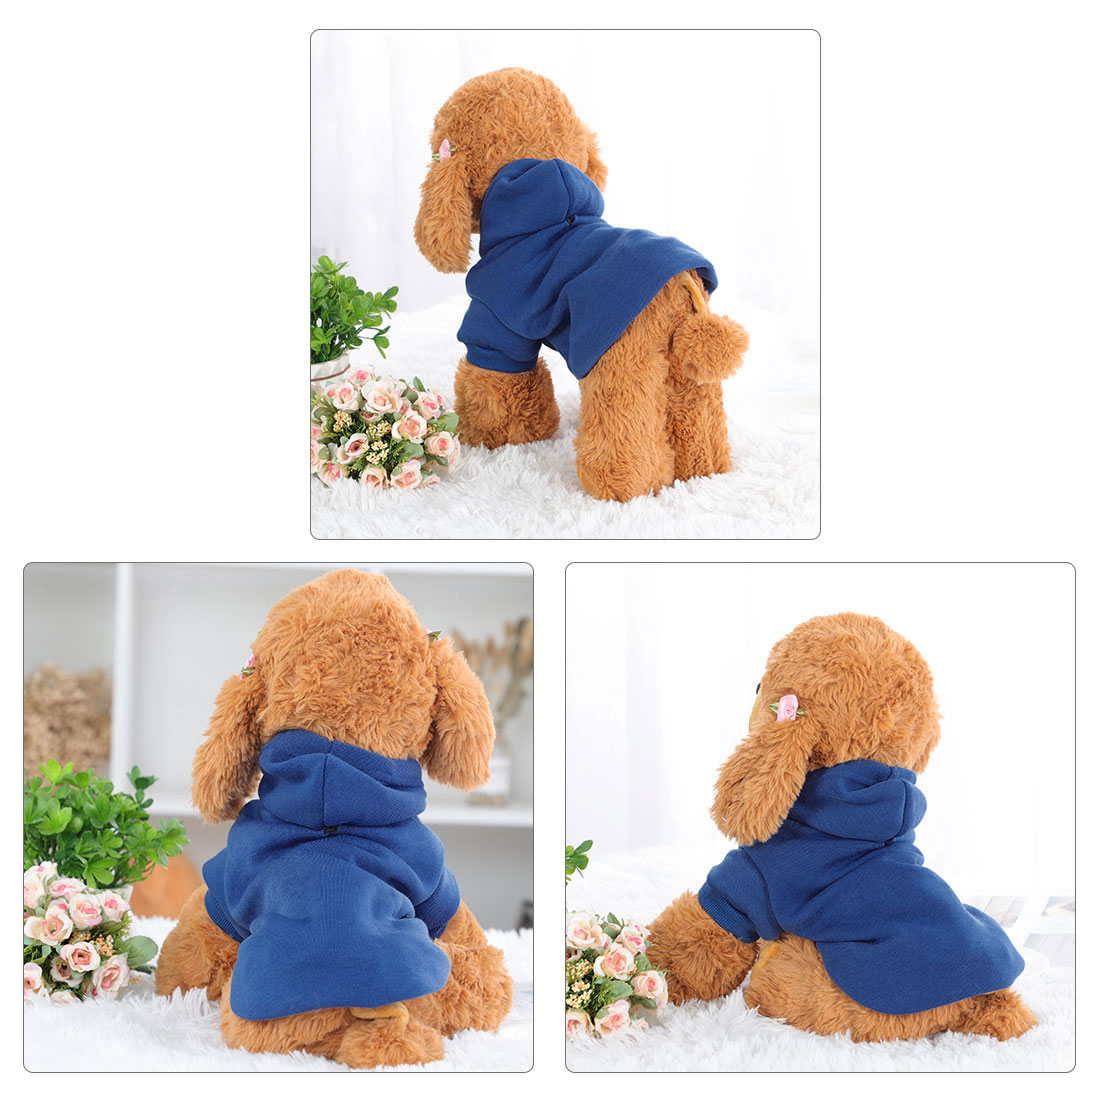 Cotton Dog Winter/Spring/Fall Sweatshirt Hoody Pet Clothes Warm Coat Blue M - image 5 of 7